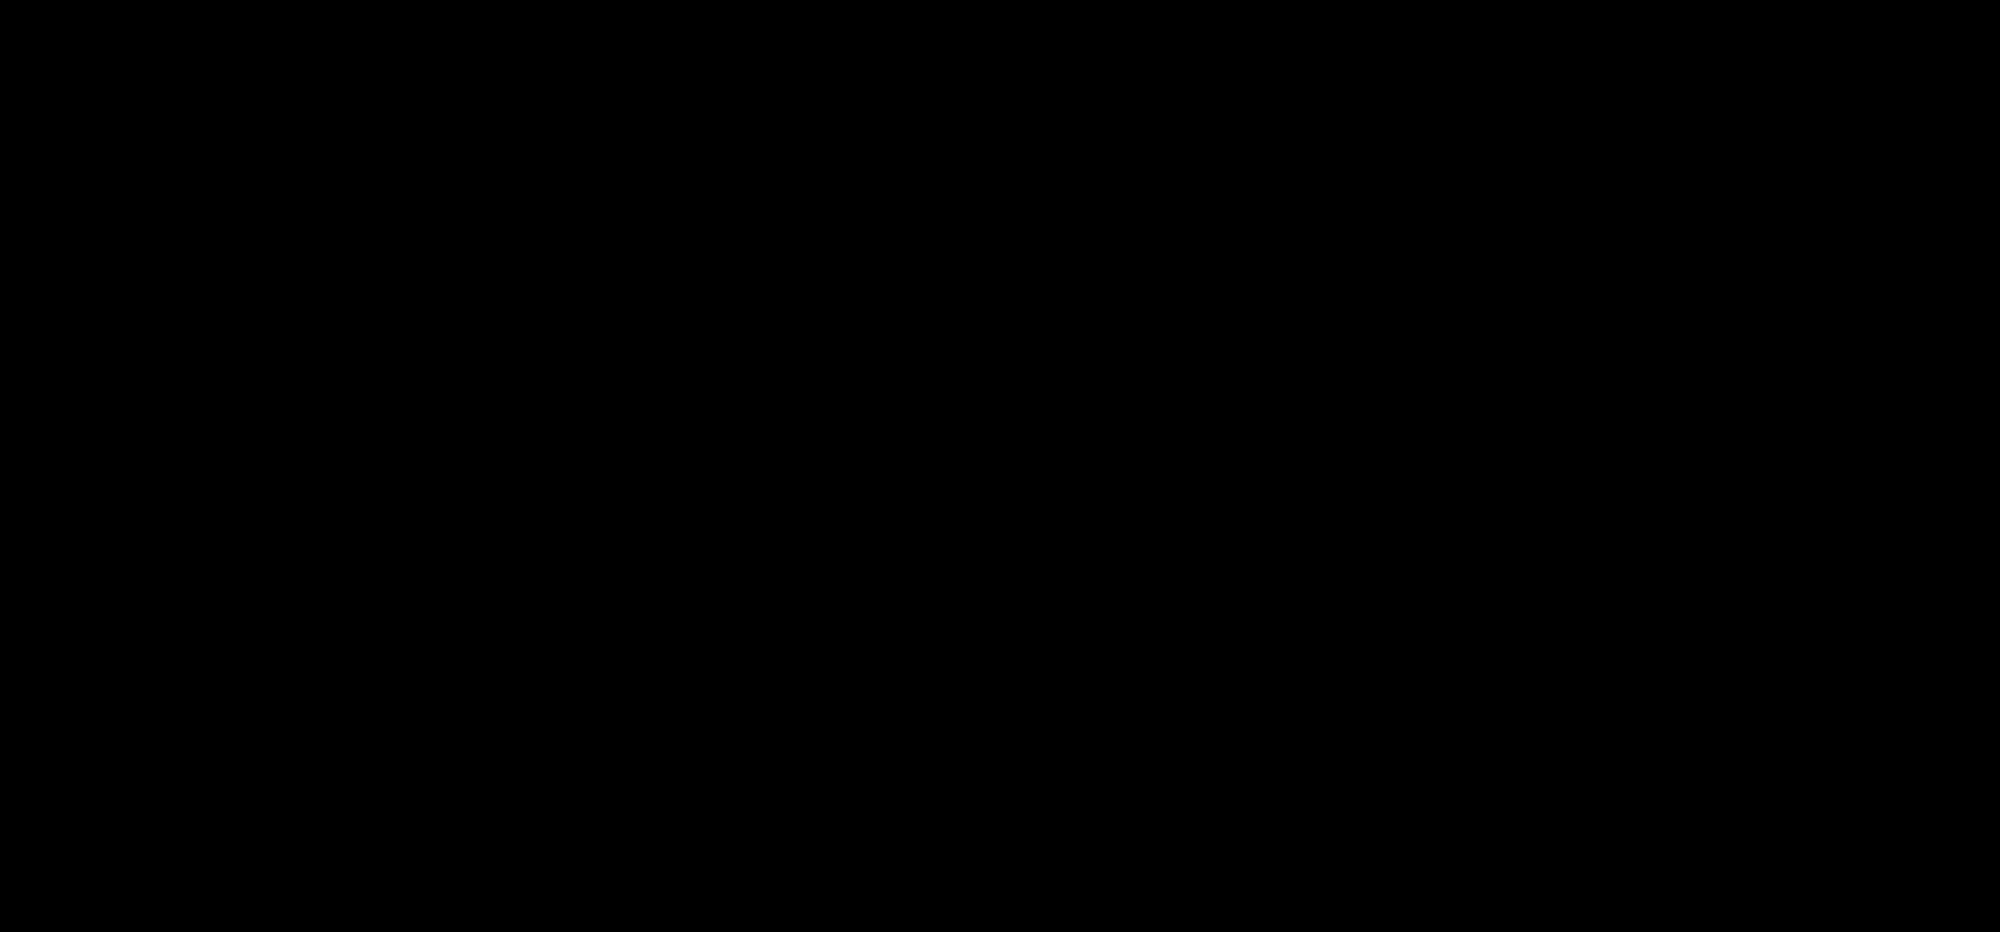 Gravure du rocher de Ramsund